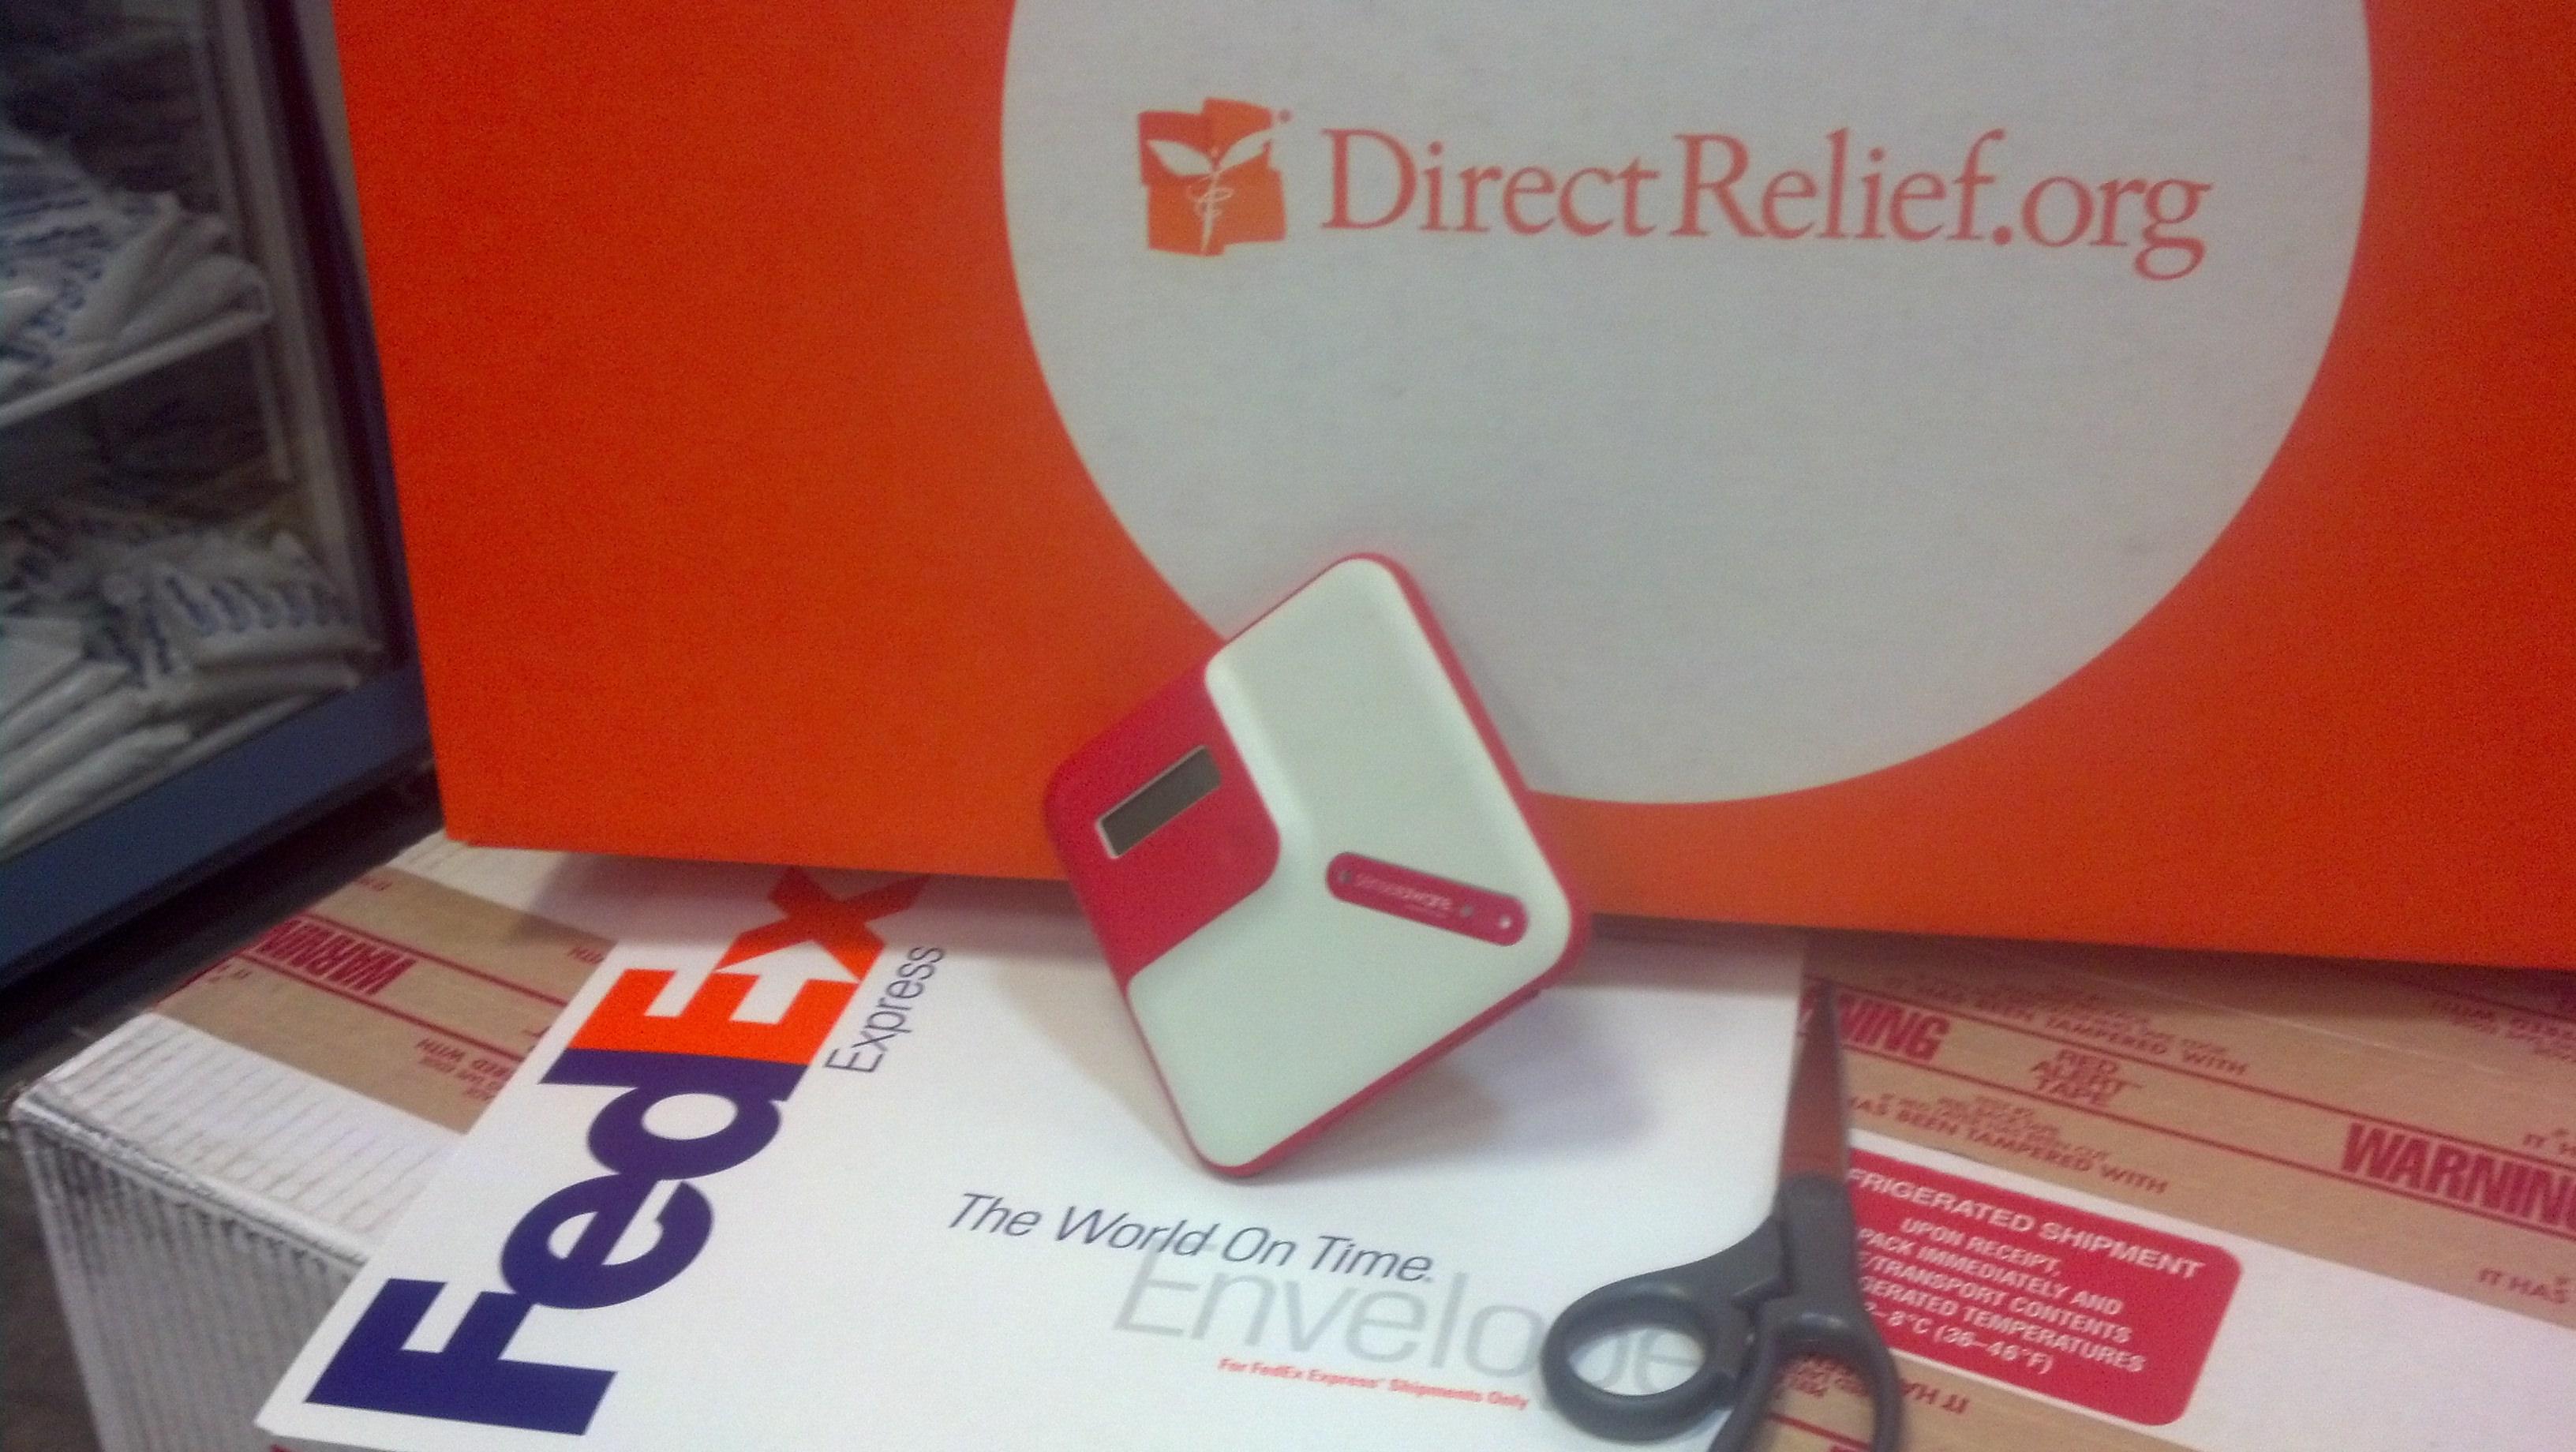 SenseAware powered by FedEx helped make Direct Relief's tornado response more efficient.